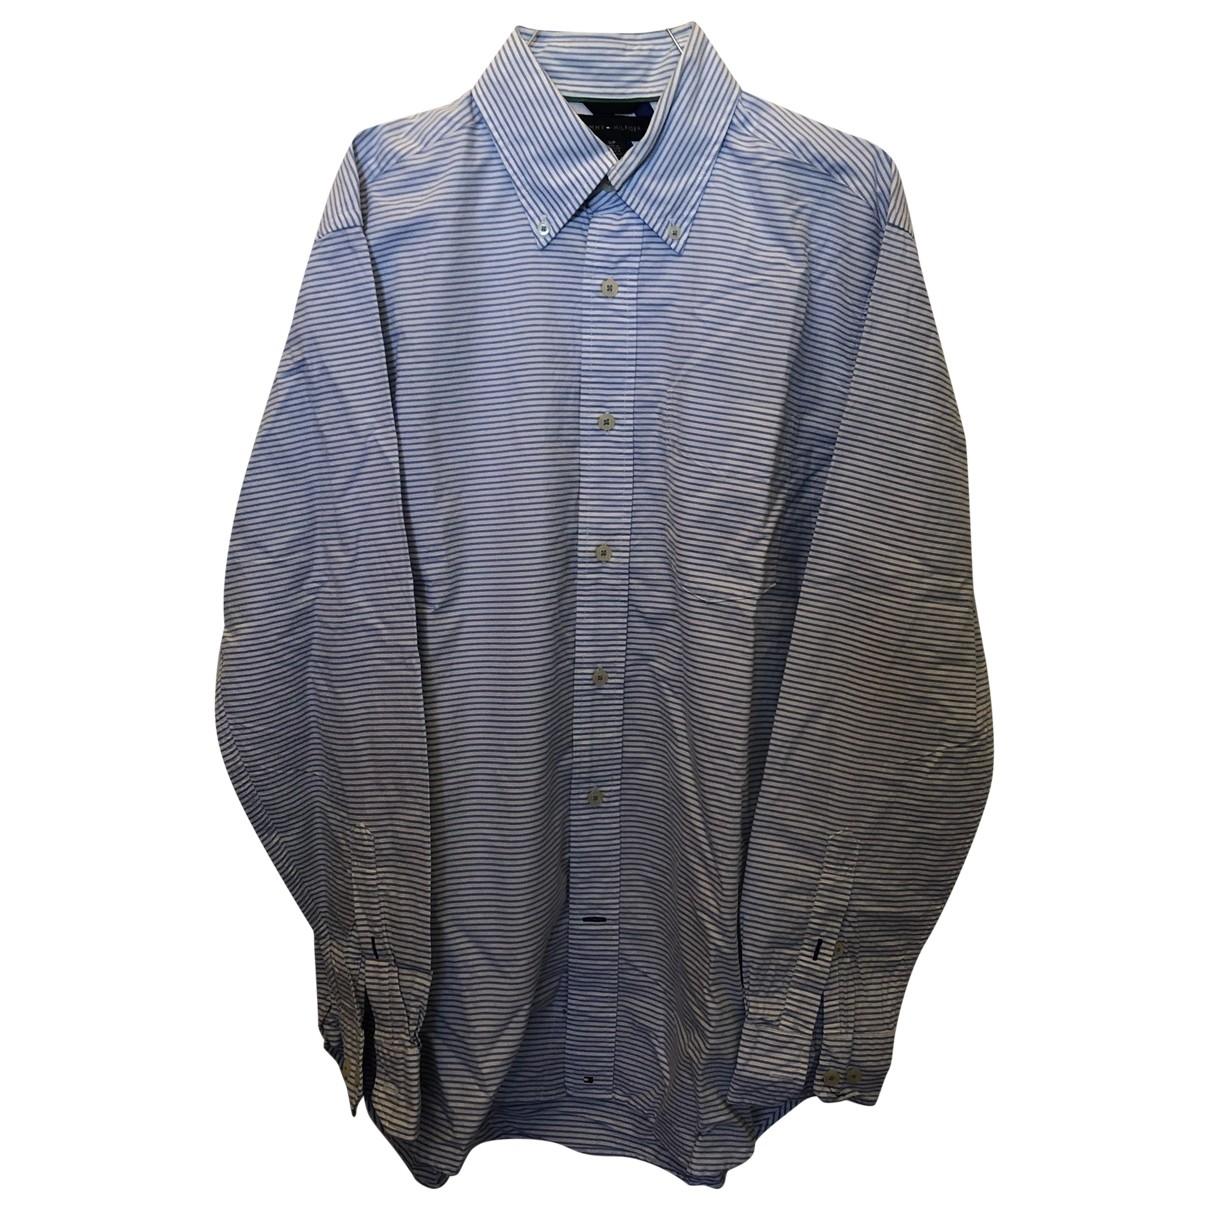 Tommy Hilfiger \N White Cotton Shirts for Men S International